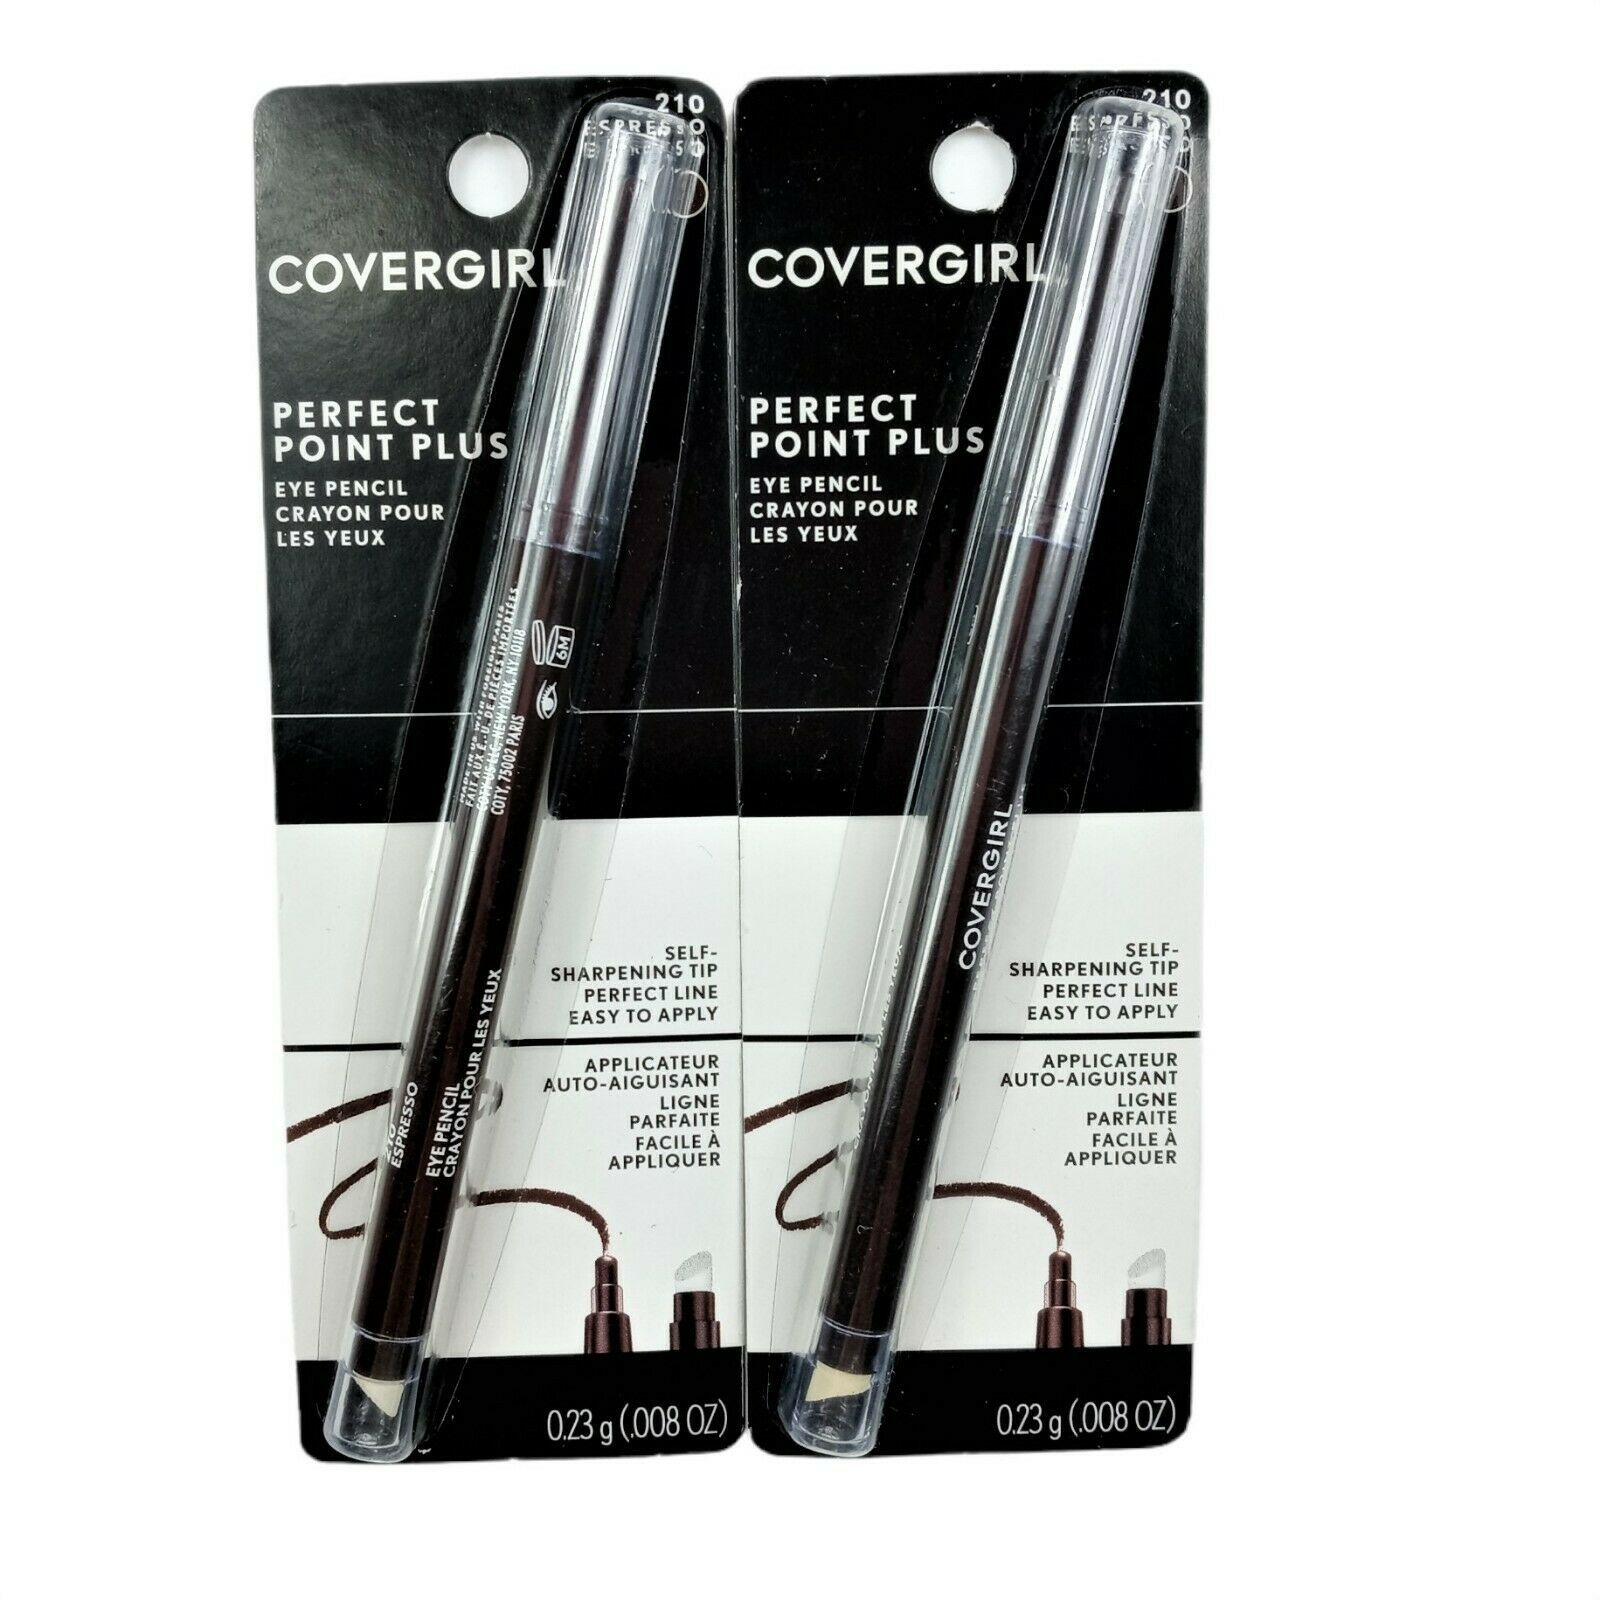 2 Pk COVERGIRL Perfect Point PLUS Eyeliner Pencil Espresso 210 - $12.89